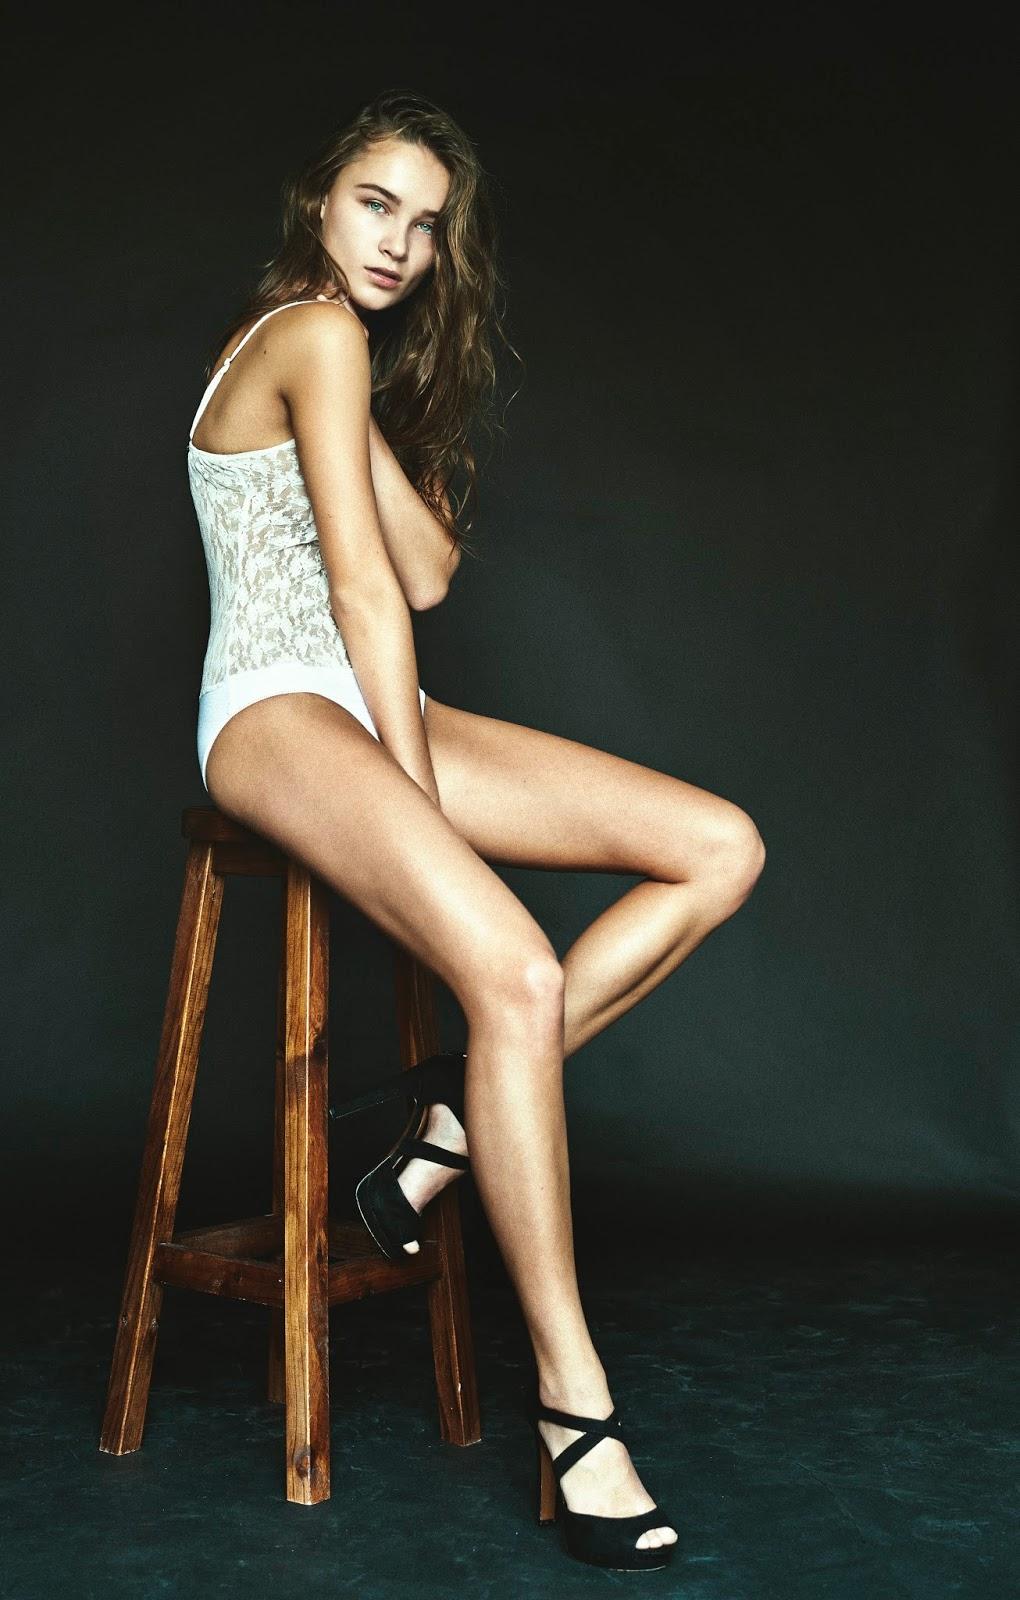 Pics Anastasiya Primak nudes (24 photos), Topless, Sideboobs, Boobs, braless 2015